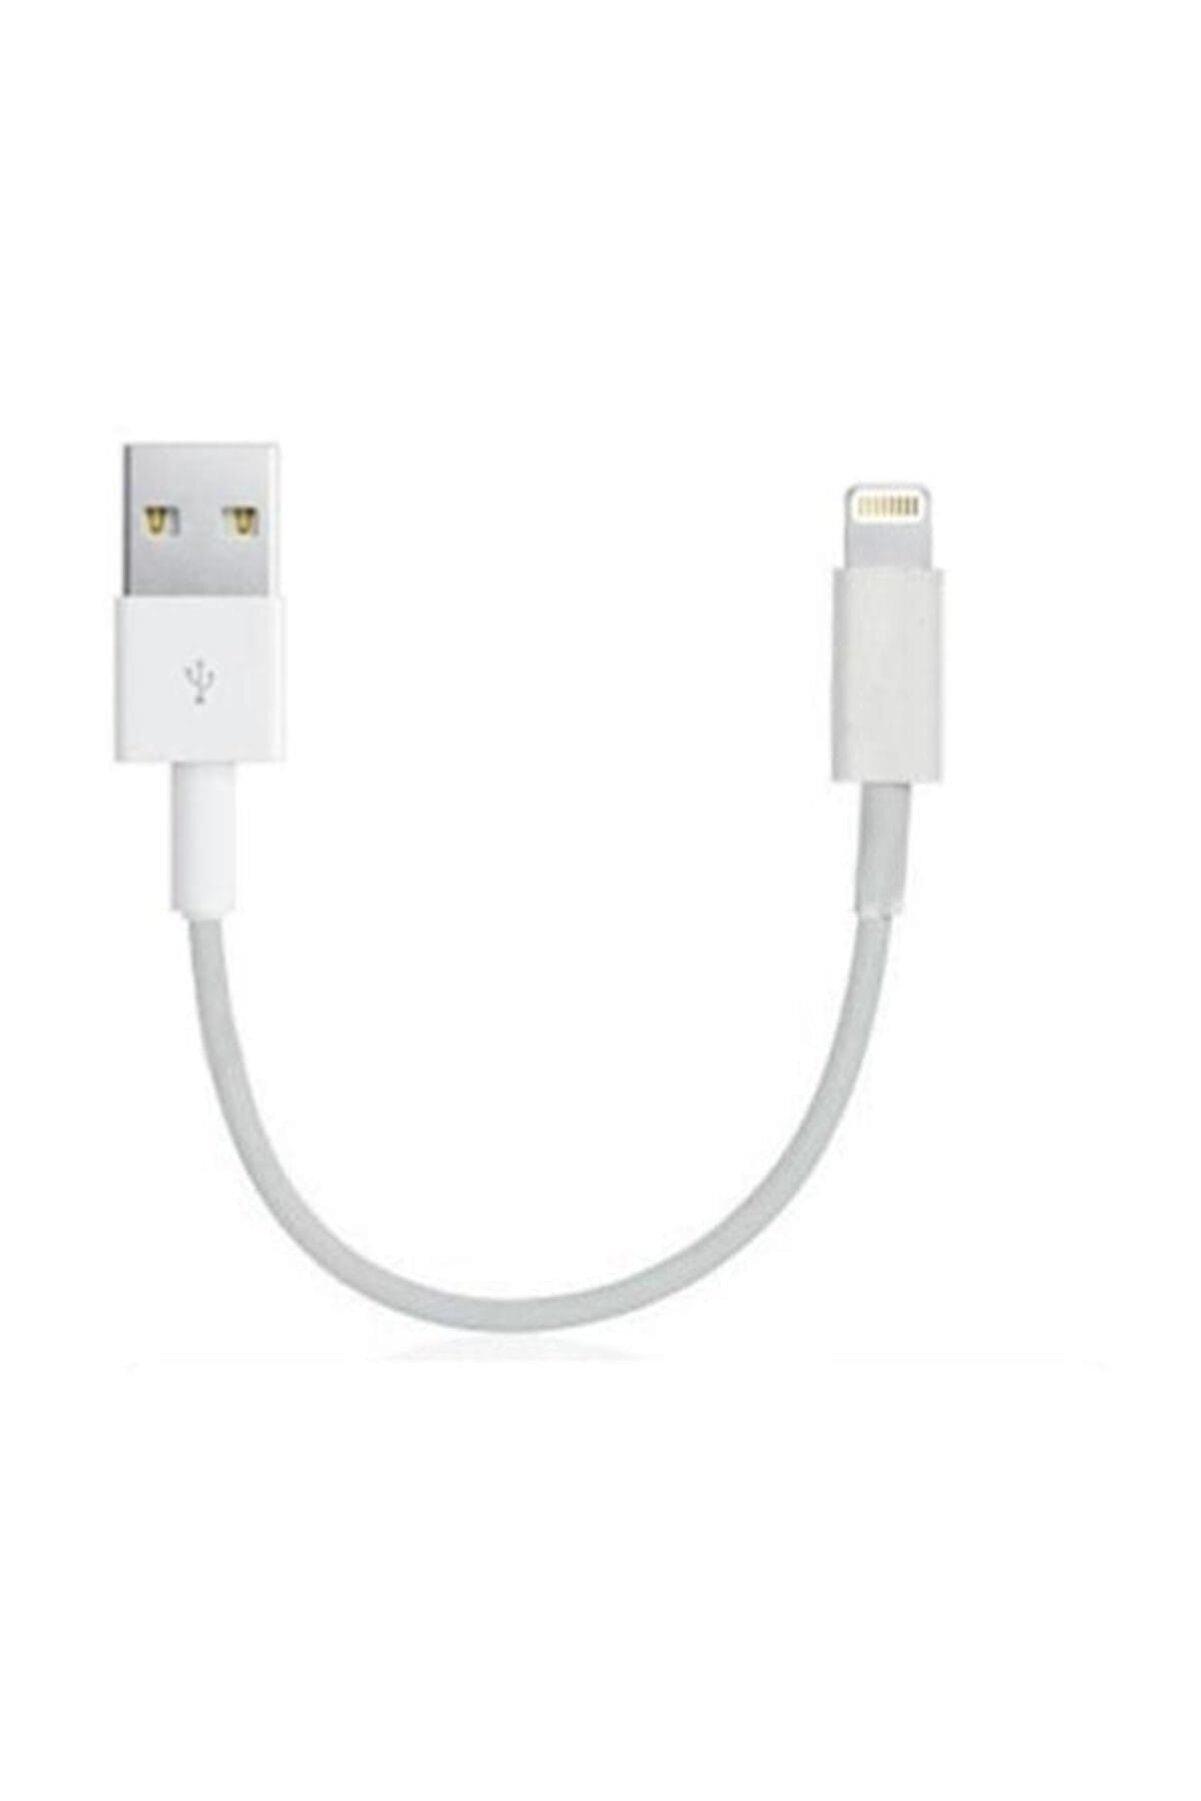 Zipax Apple iPhone 5 5S 5C 6 6S 6 7 Plus Kısa USB Data Kablosu